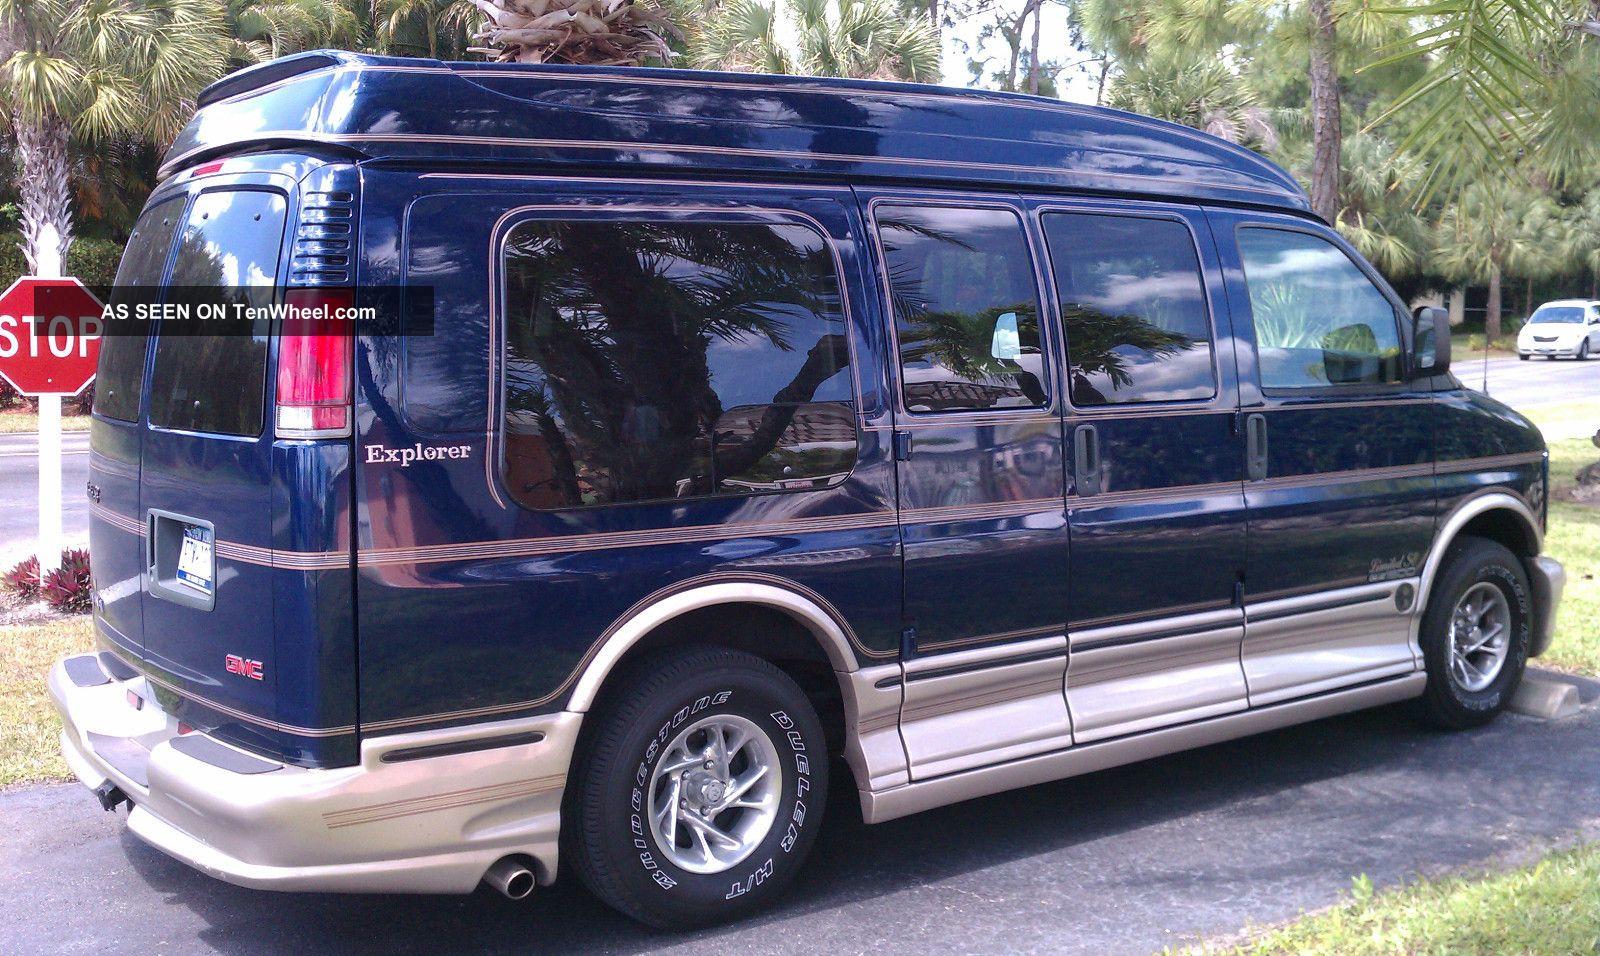 Chevy Gmc Savana 1500 Dodge Ram Van B Series Power Explorer Conversion Wiring Diagram 2001 Base Standard Passenger 3 Door